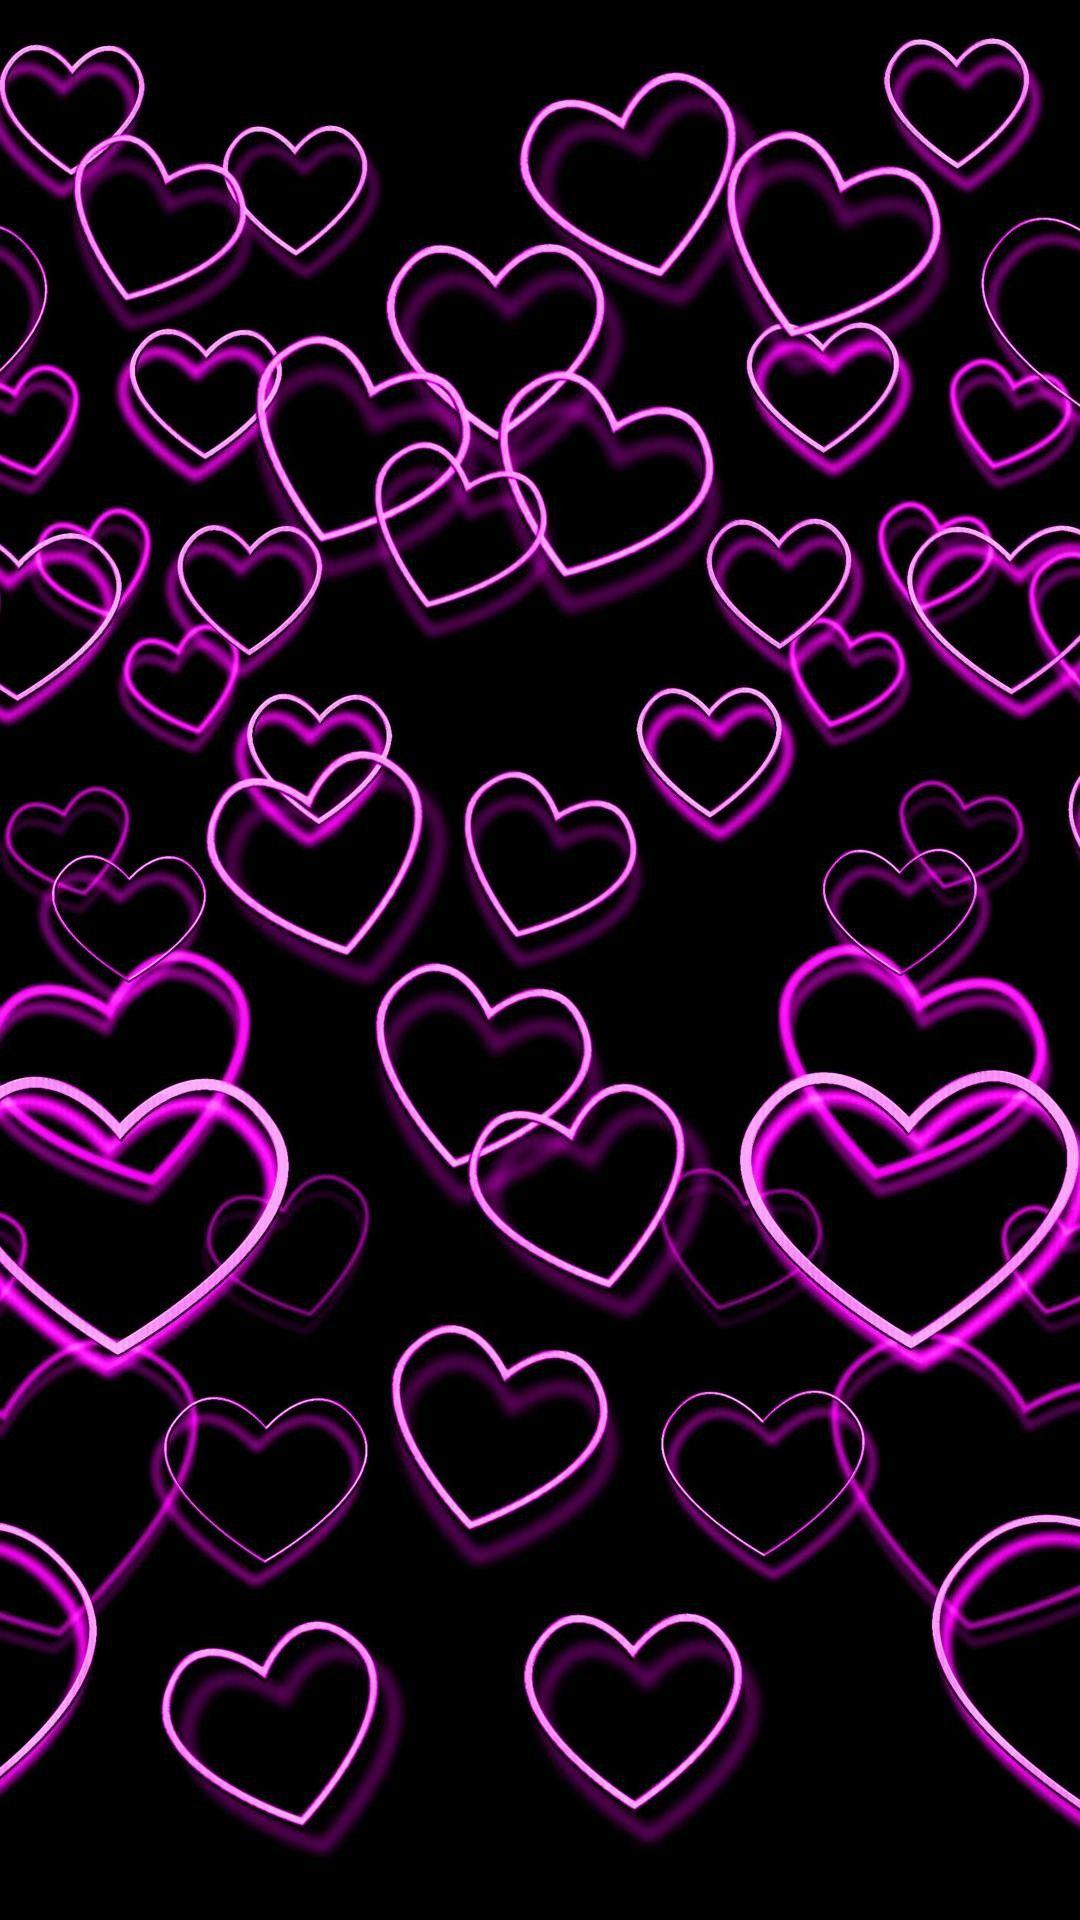 I Love You Heart Wallpaper Wallpaper Whatsapp Background